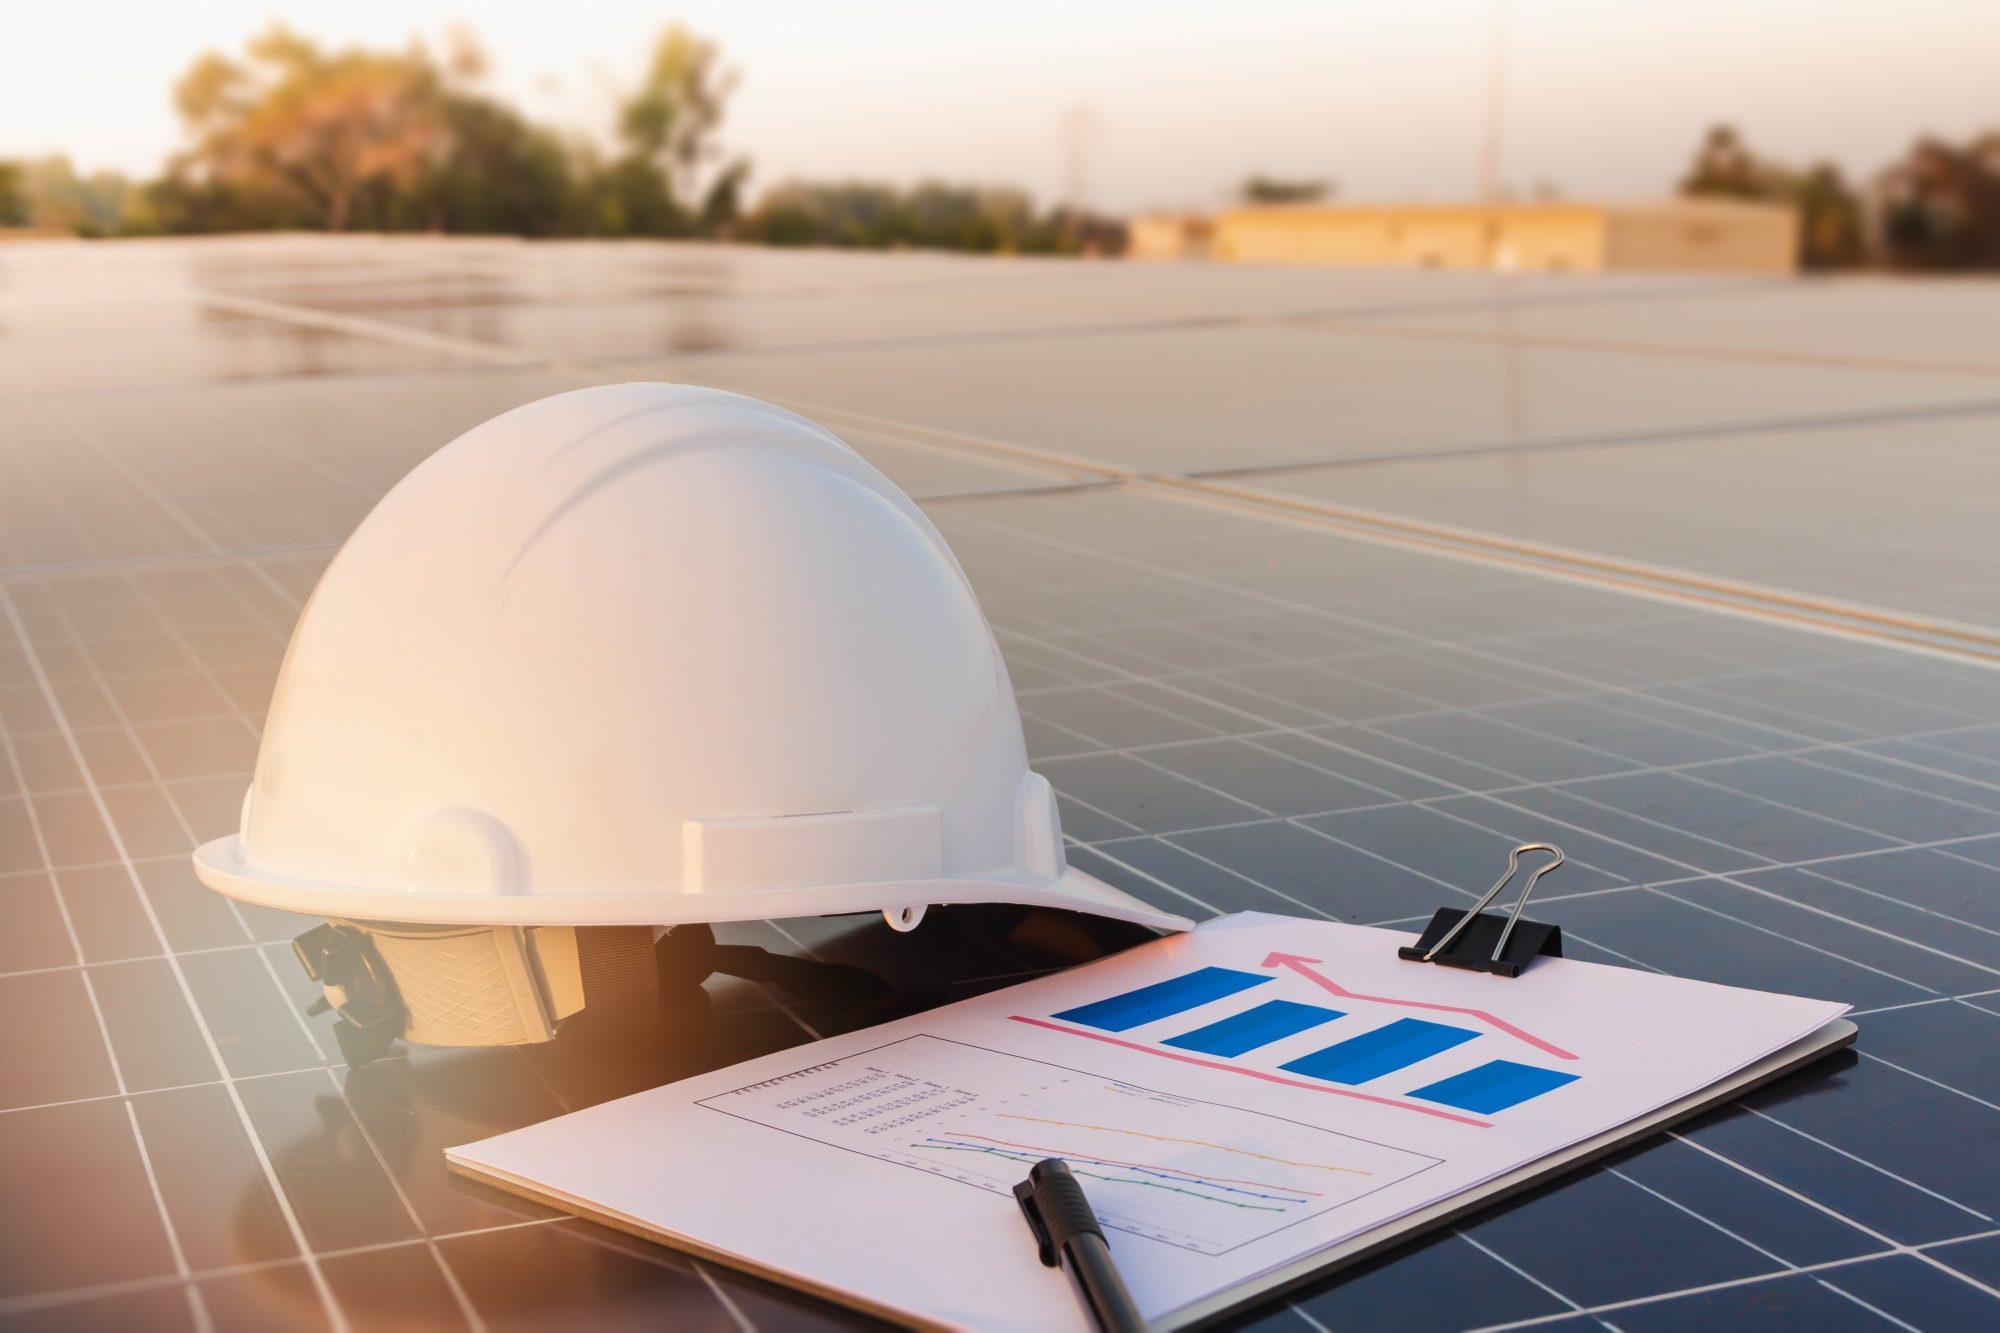 Is solar still a good investment?